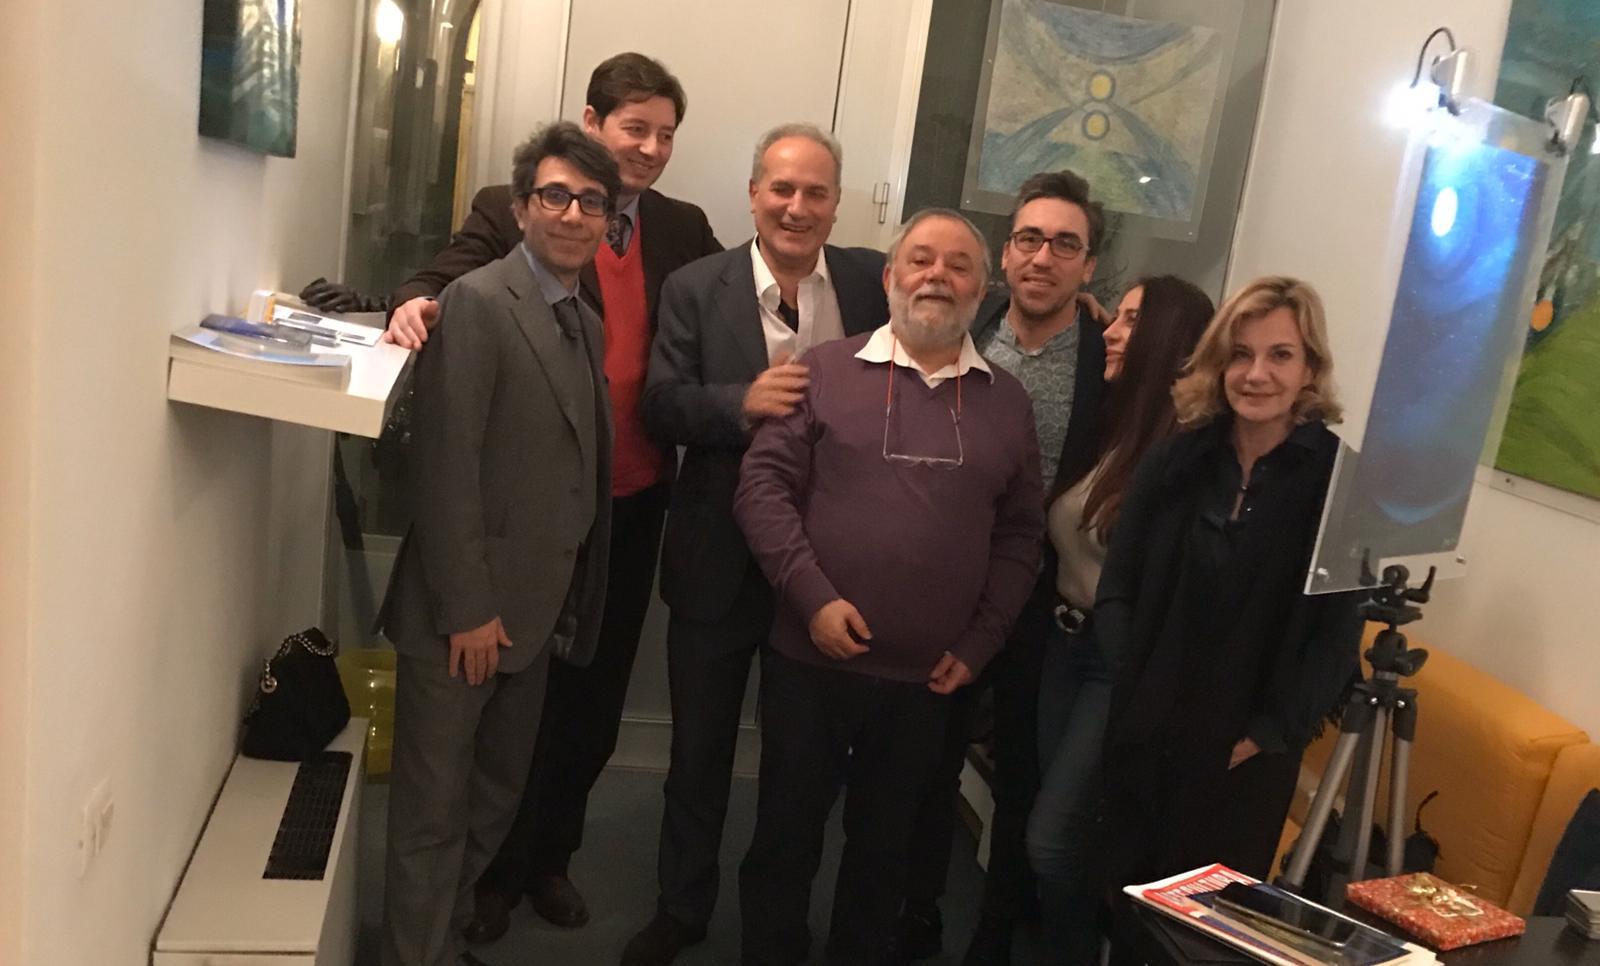 Da sx Gabriele Guglielmino Marco Marinacci Giuseppe Siniscalchi Salvino Sagone Domenico Melillo Shahrzad Amirsadeghi Ilse Loesh